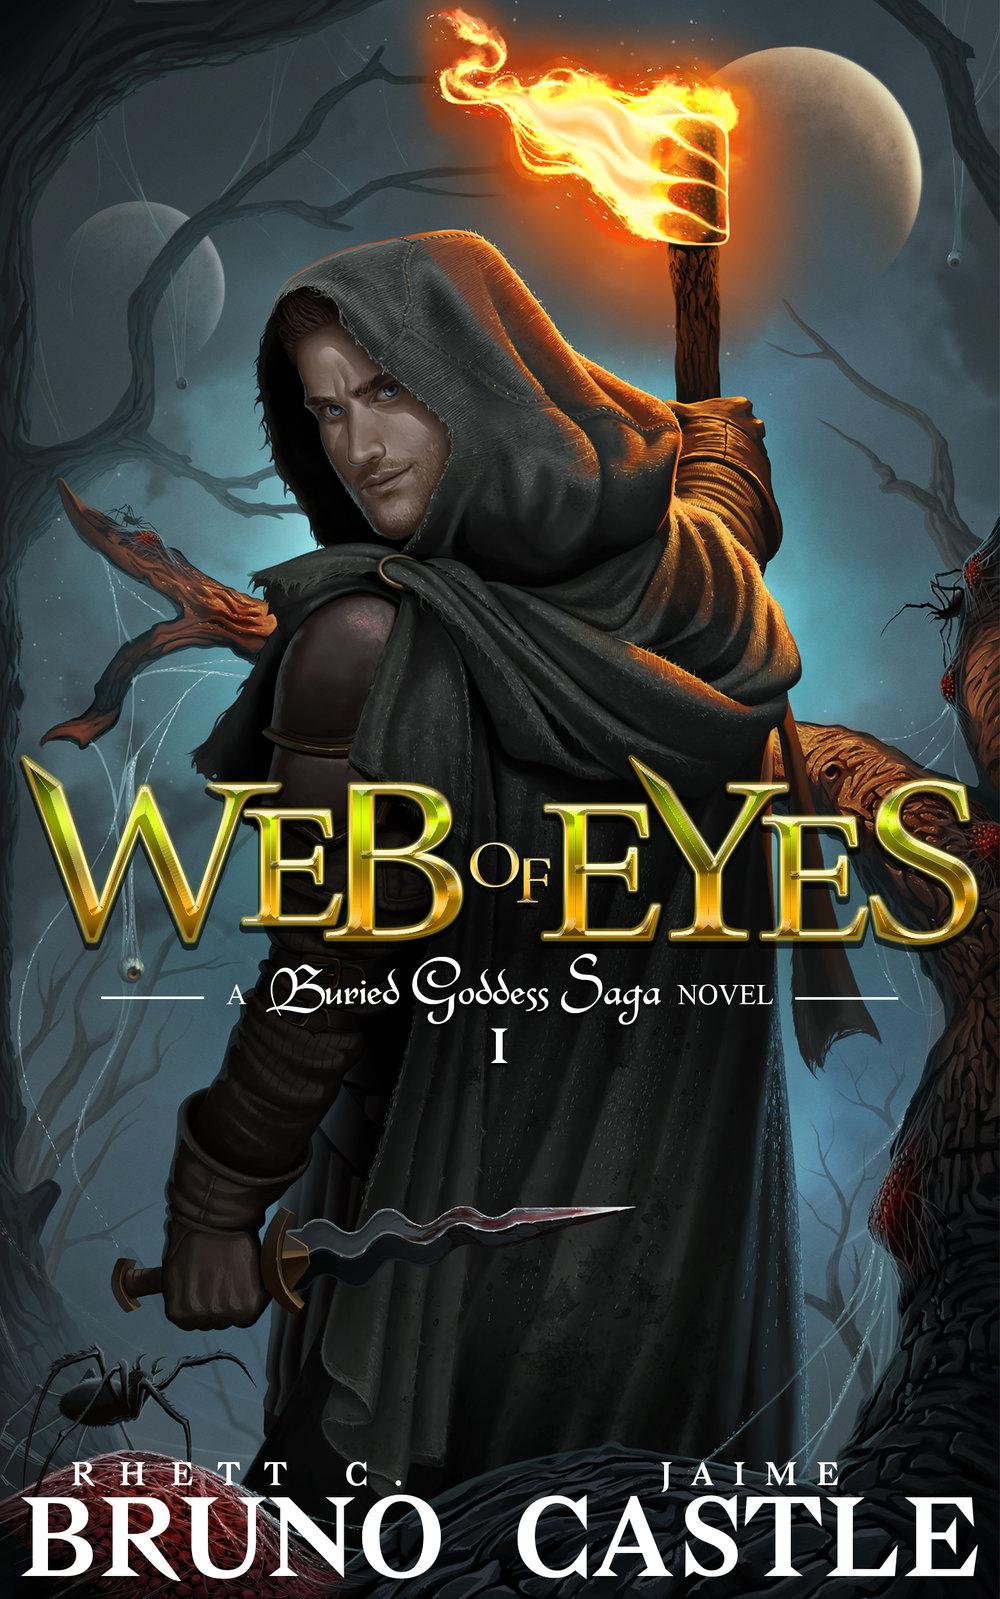 Web of Eyes   Buried Goddess Saga Book 1  Rhett C. Bruno & Jaime Castle